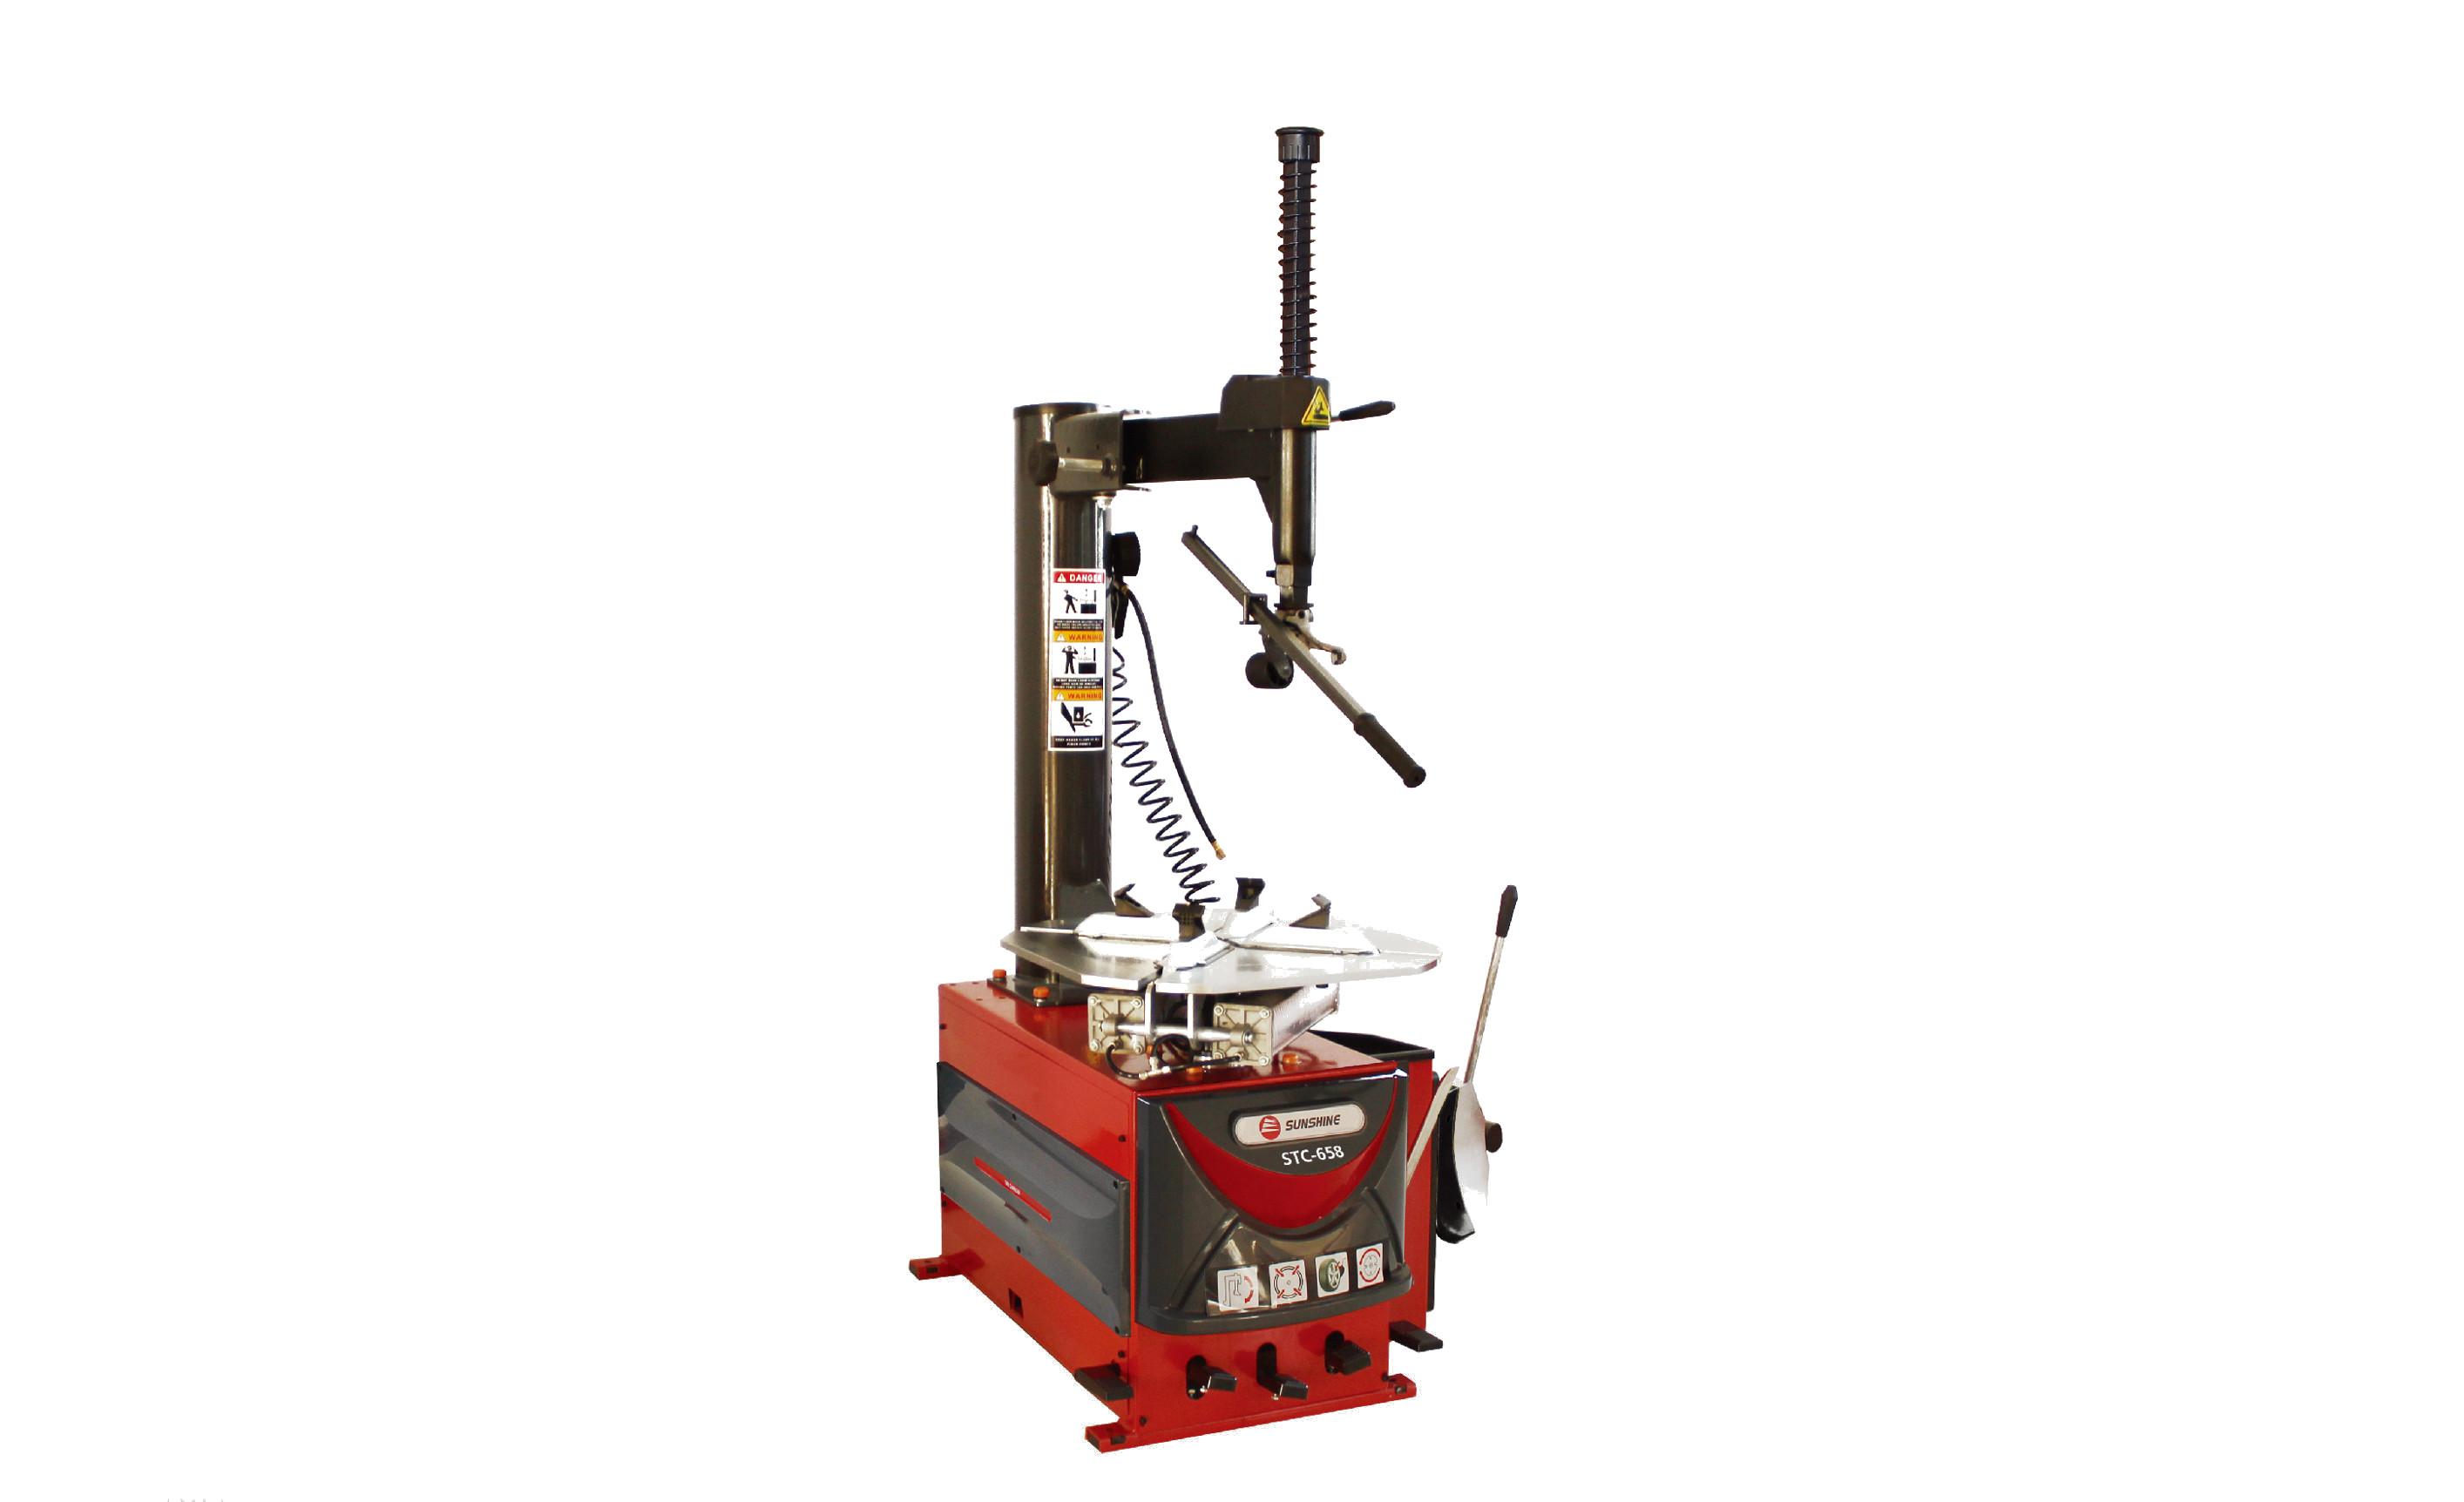 Reifenmontagemaschine STC-658